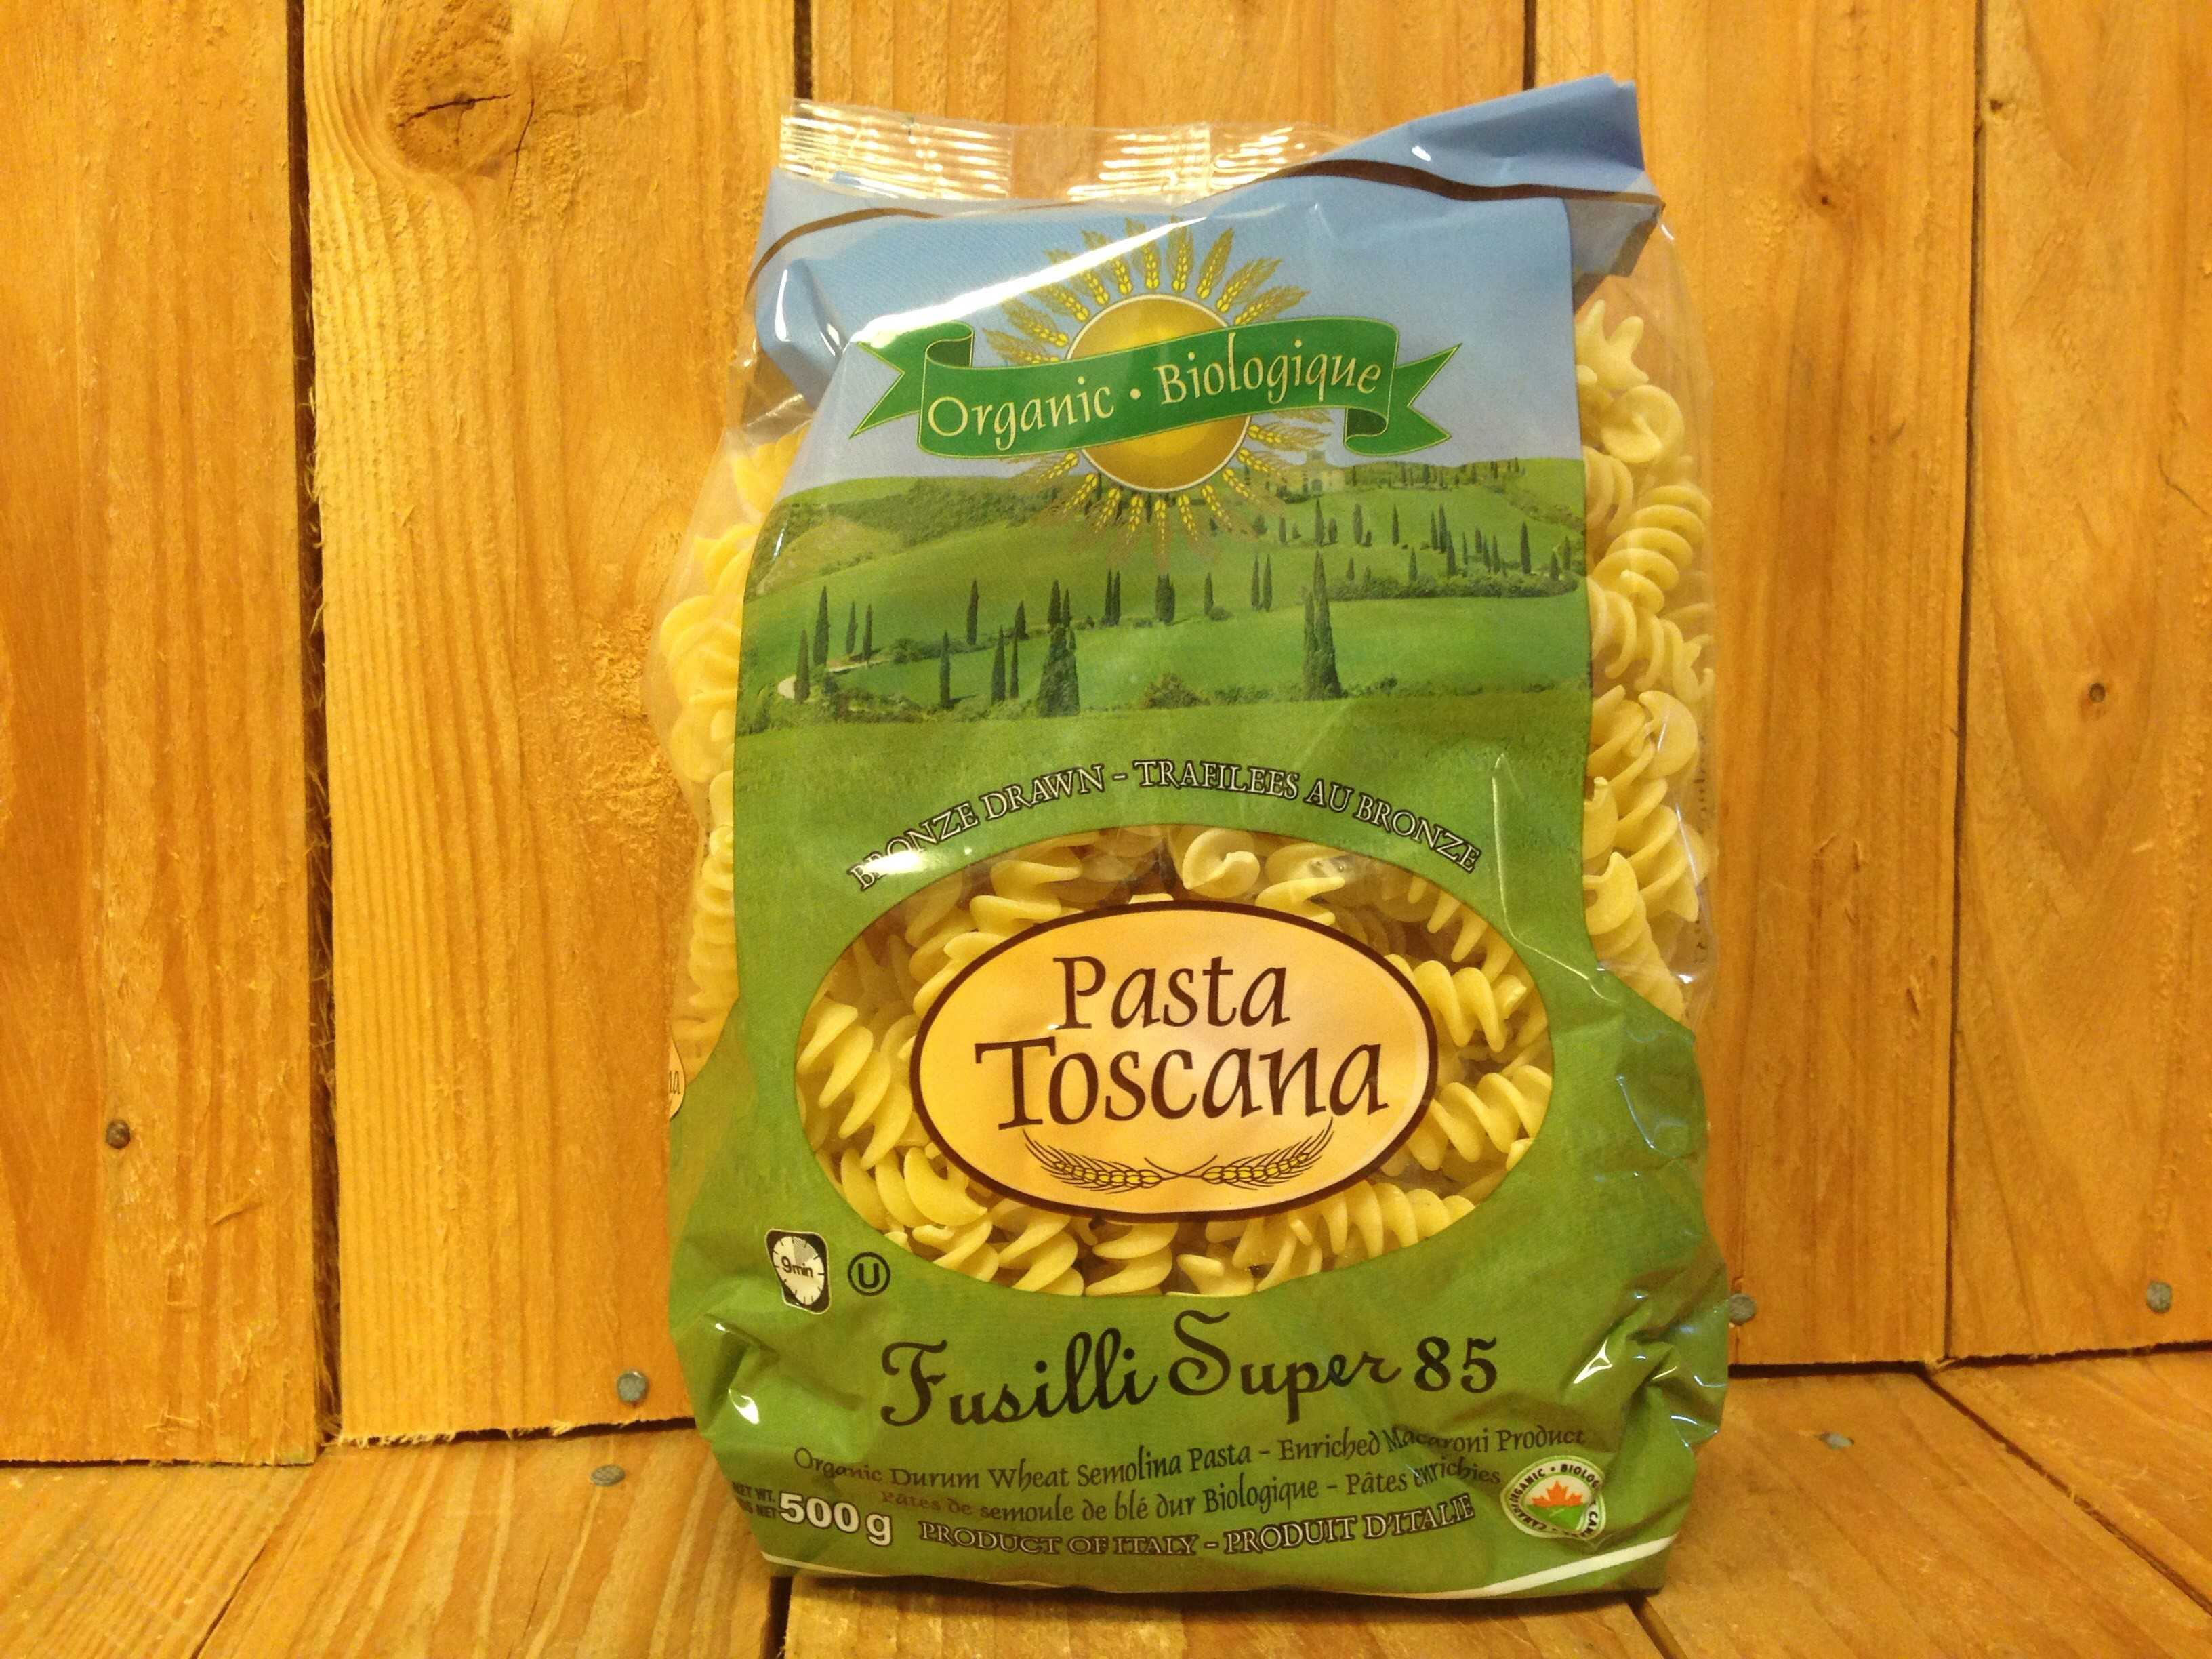 Pasta Toscana – Organic Fusilli – Durum Wheat (500g Bag)